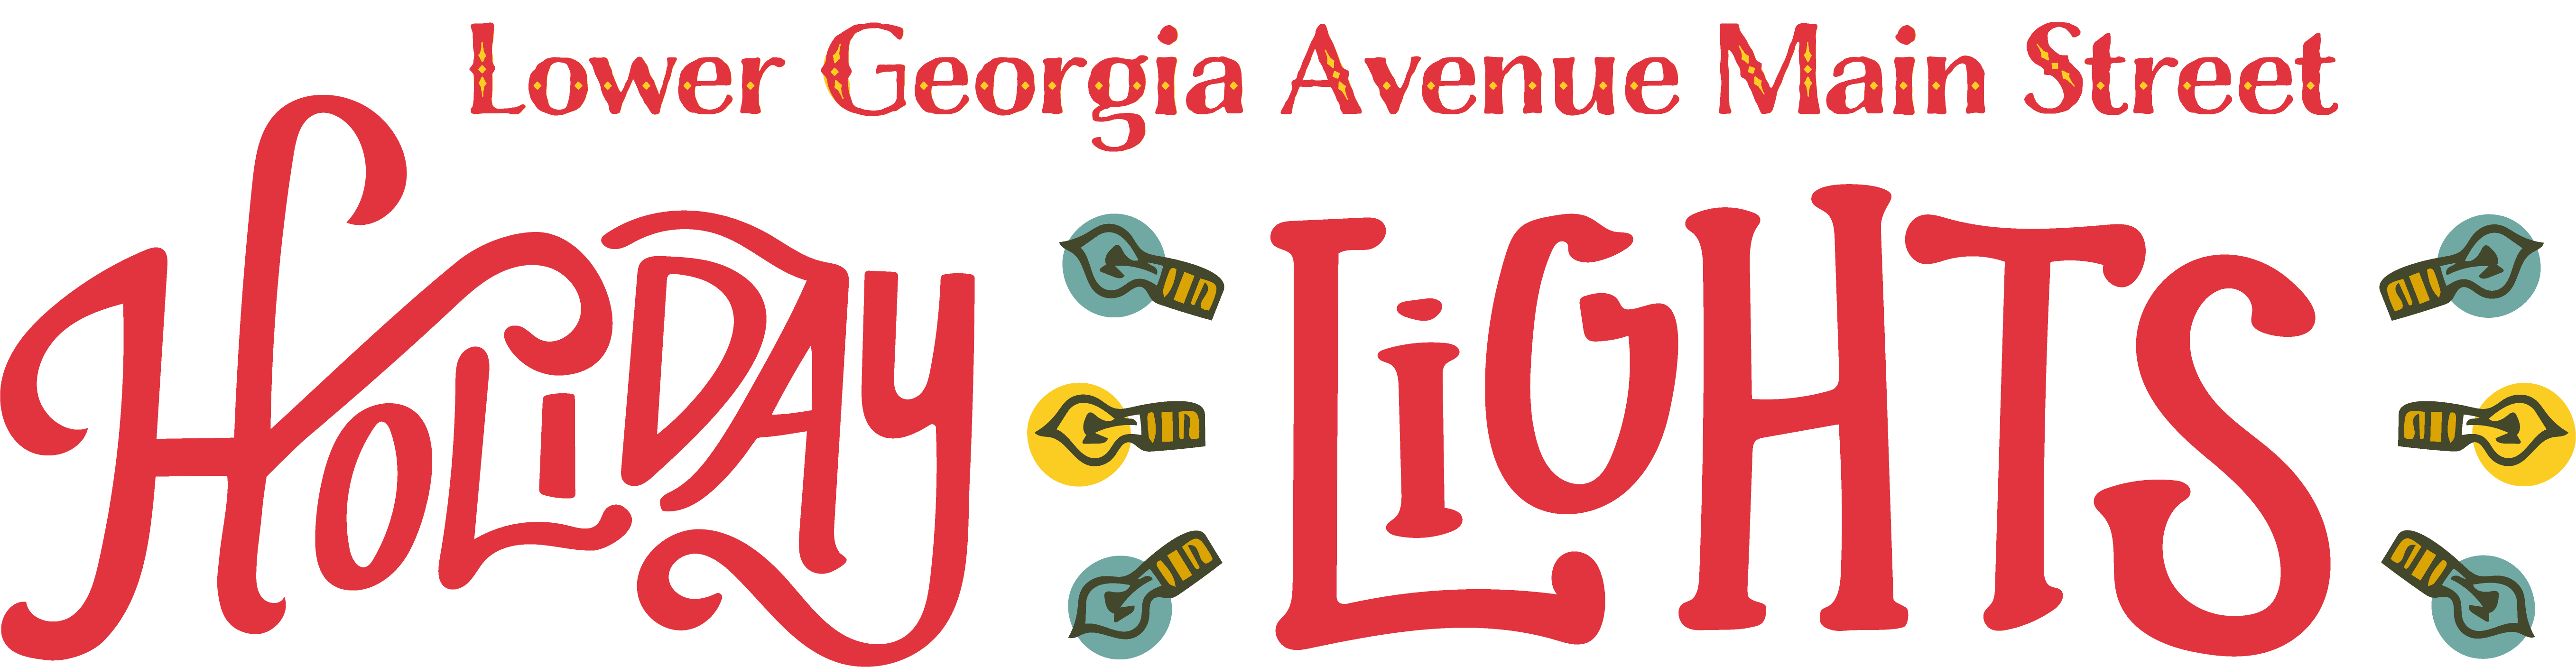 Lower Georgia Avenue Main Street Holiday Lights